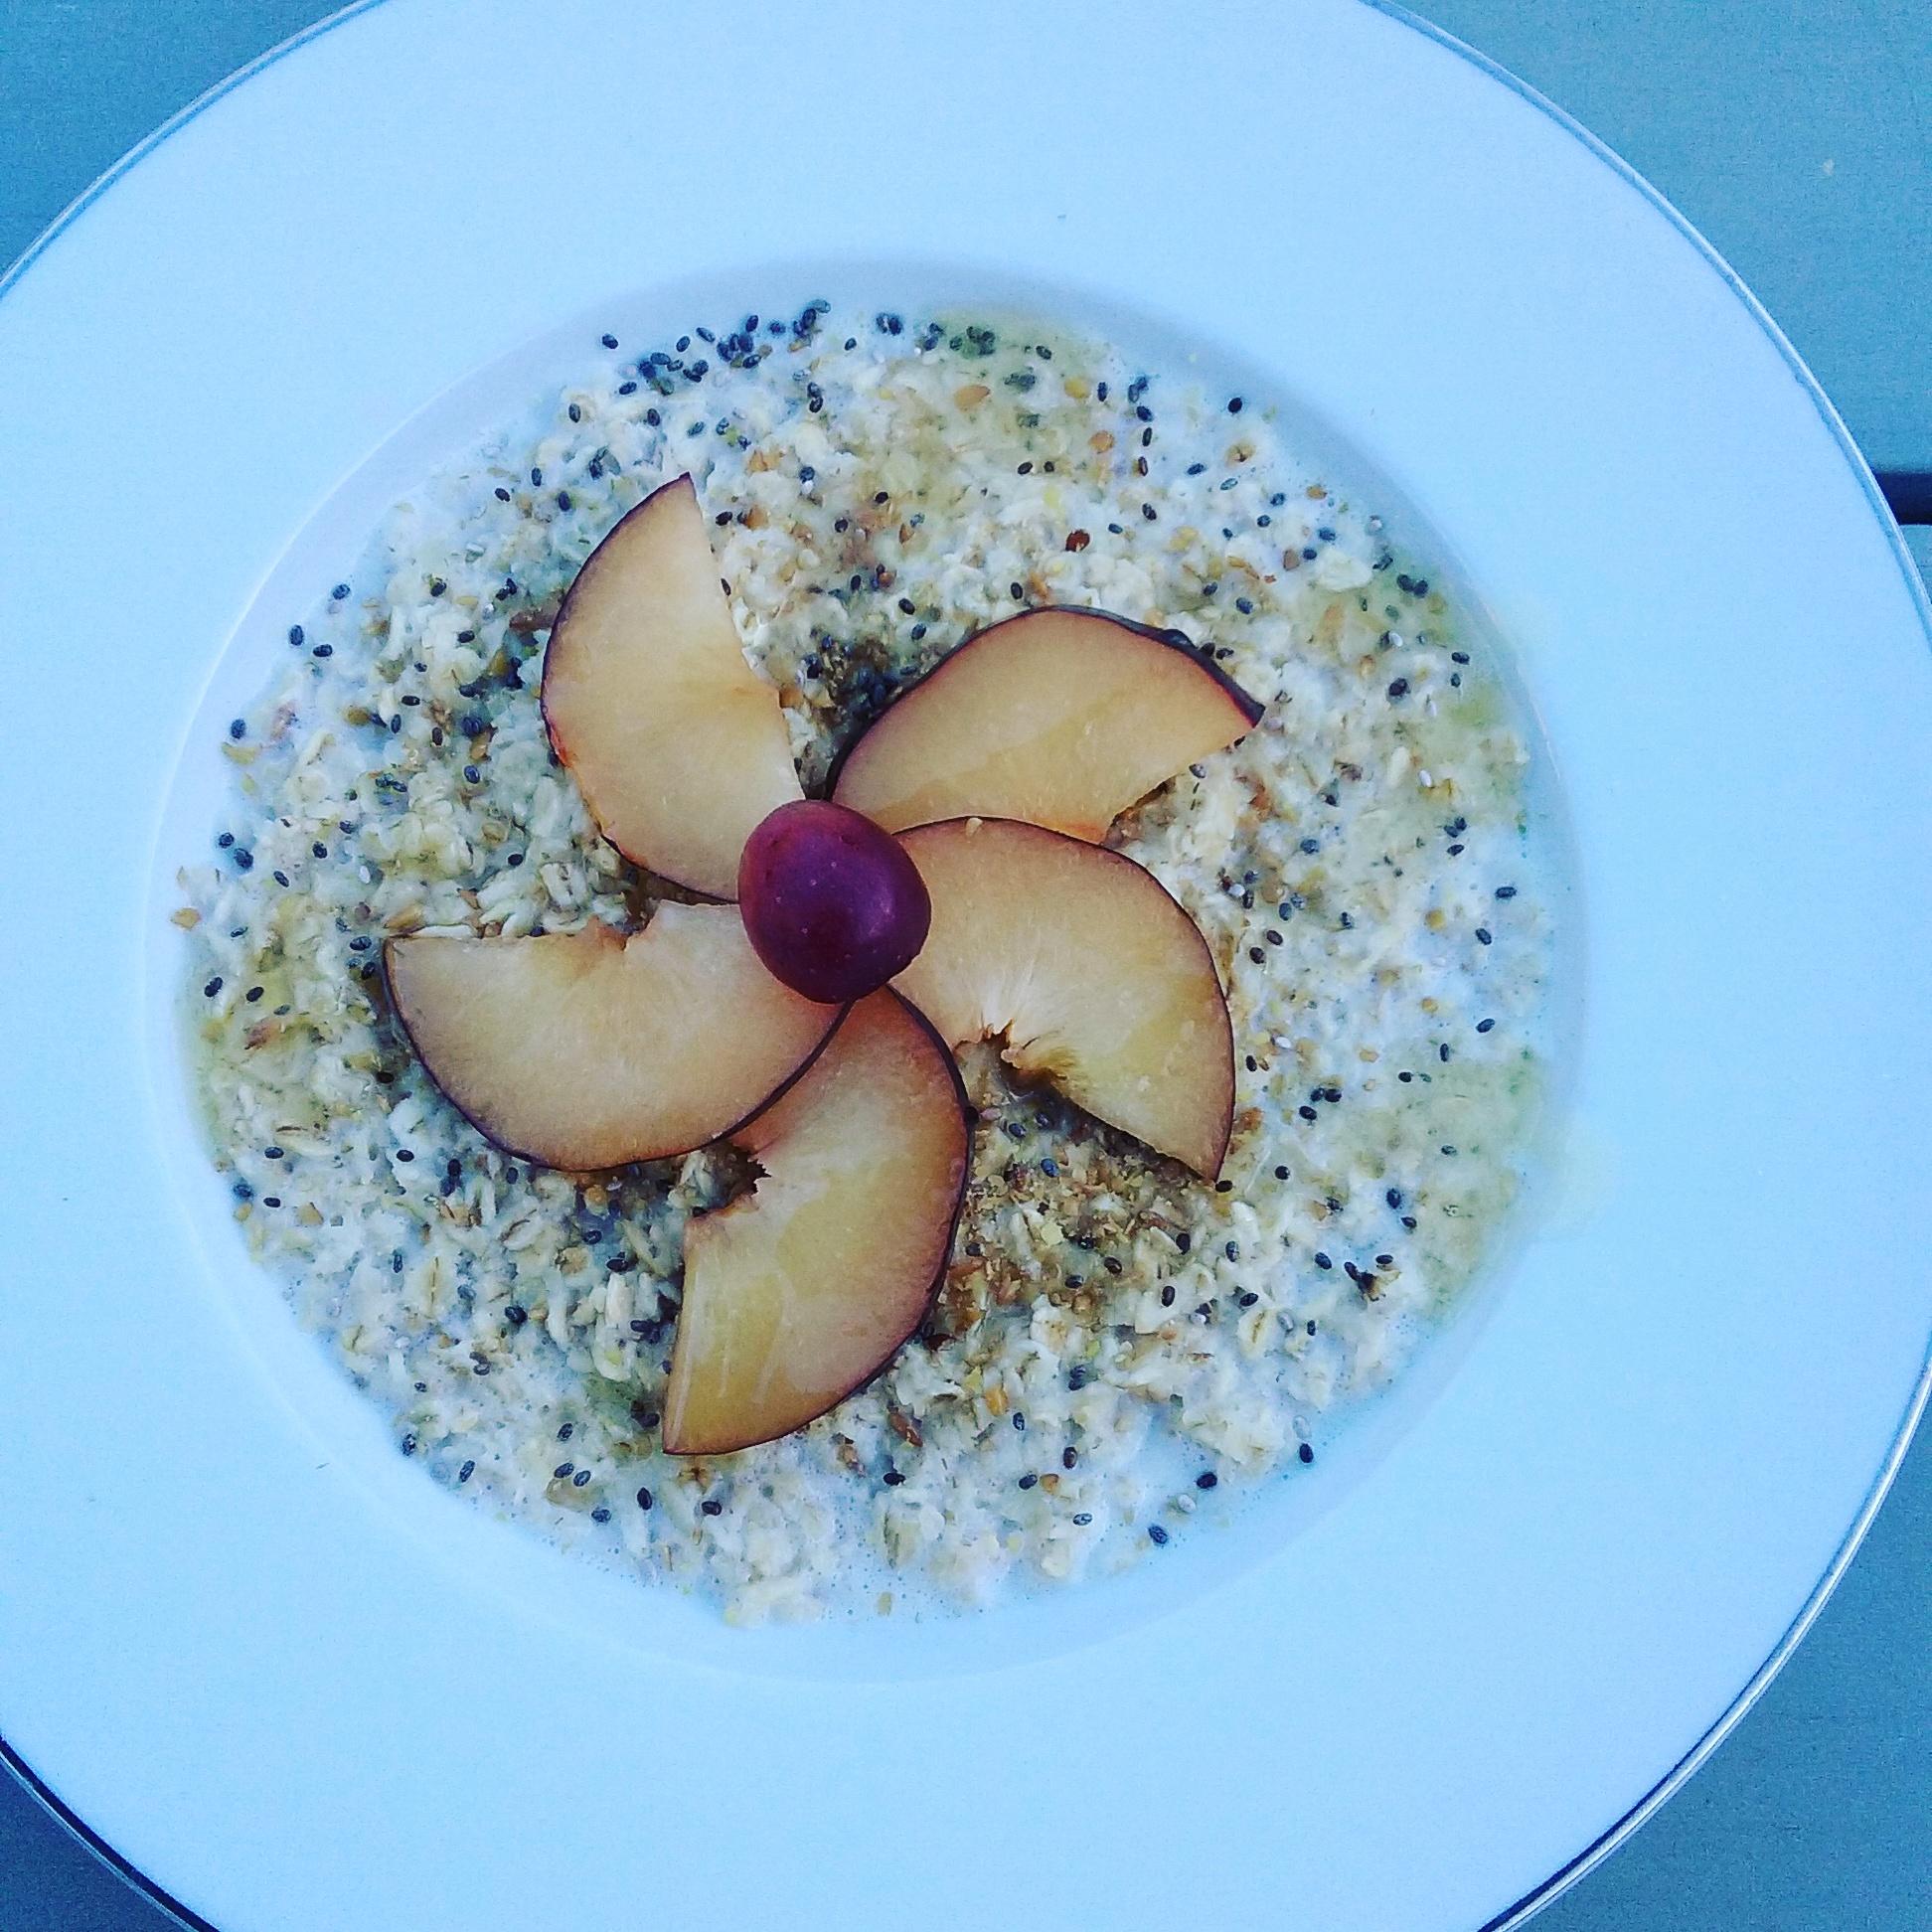 flatlay of porridge with plum and breakfast seeds